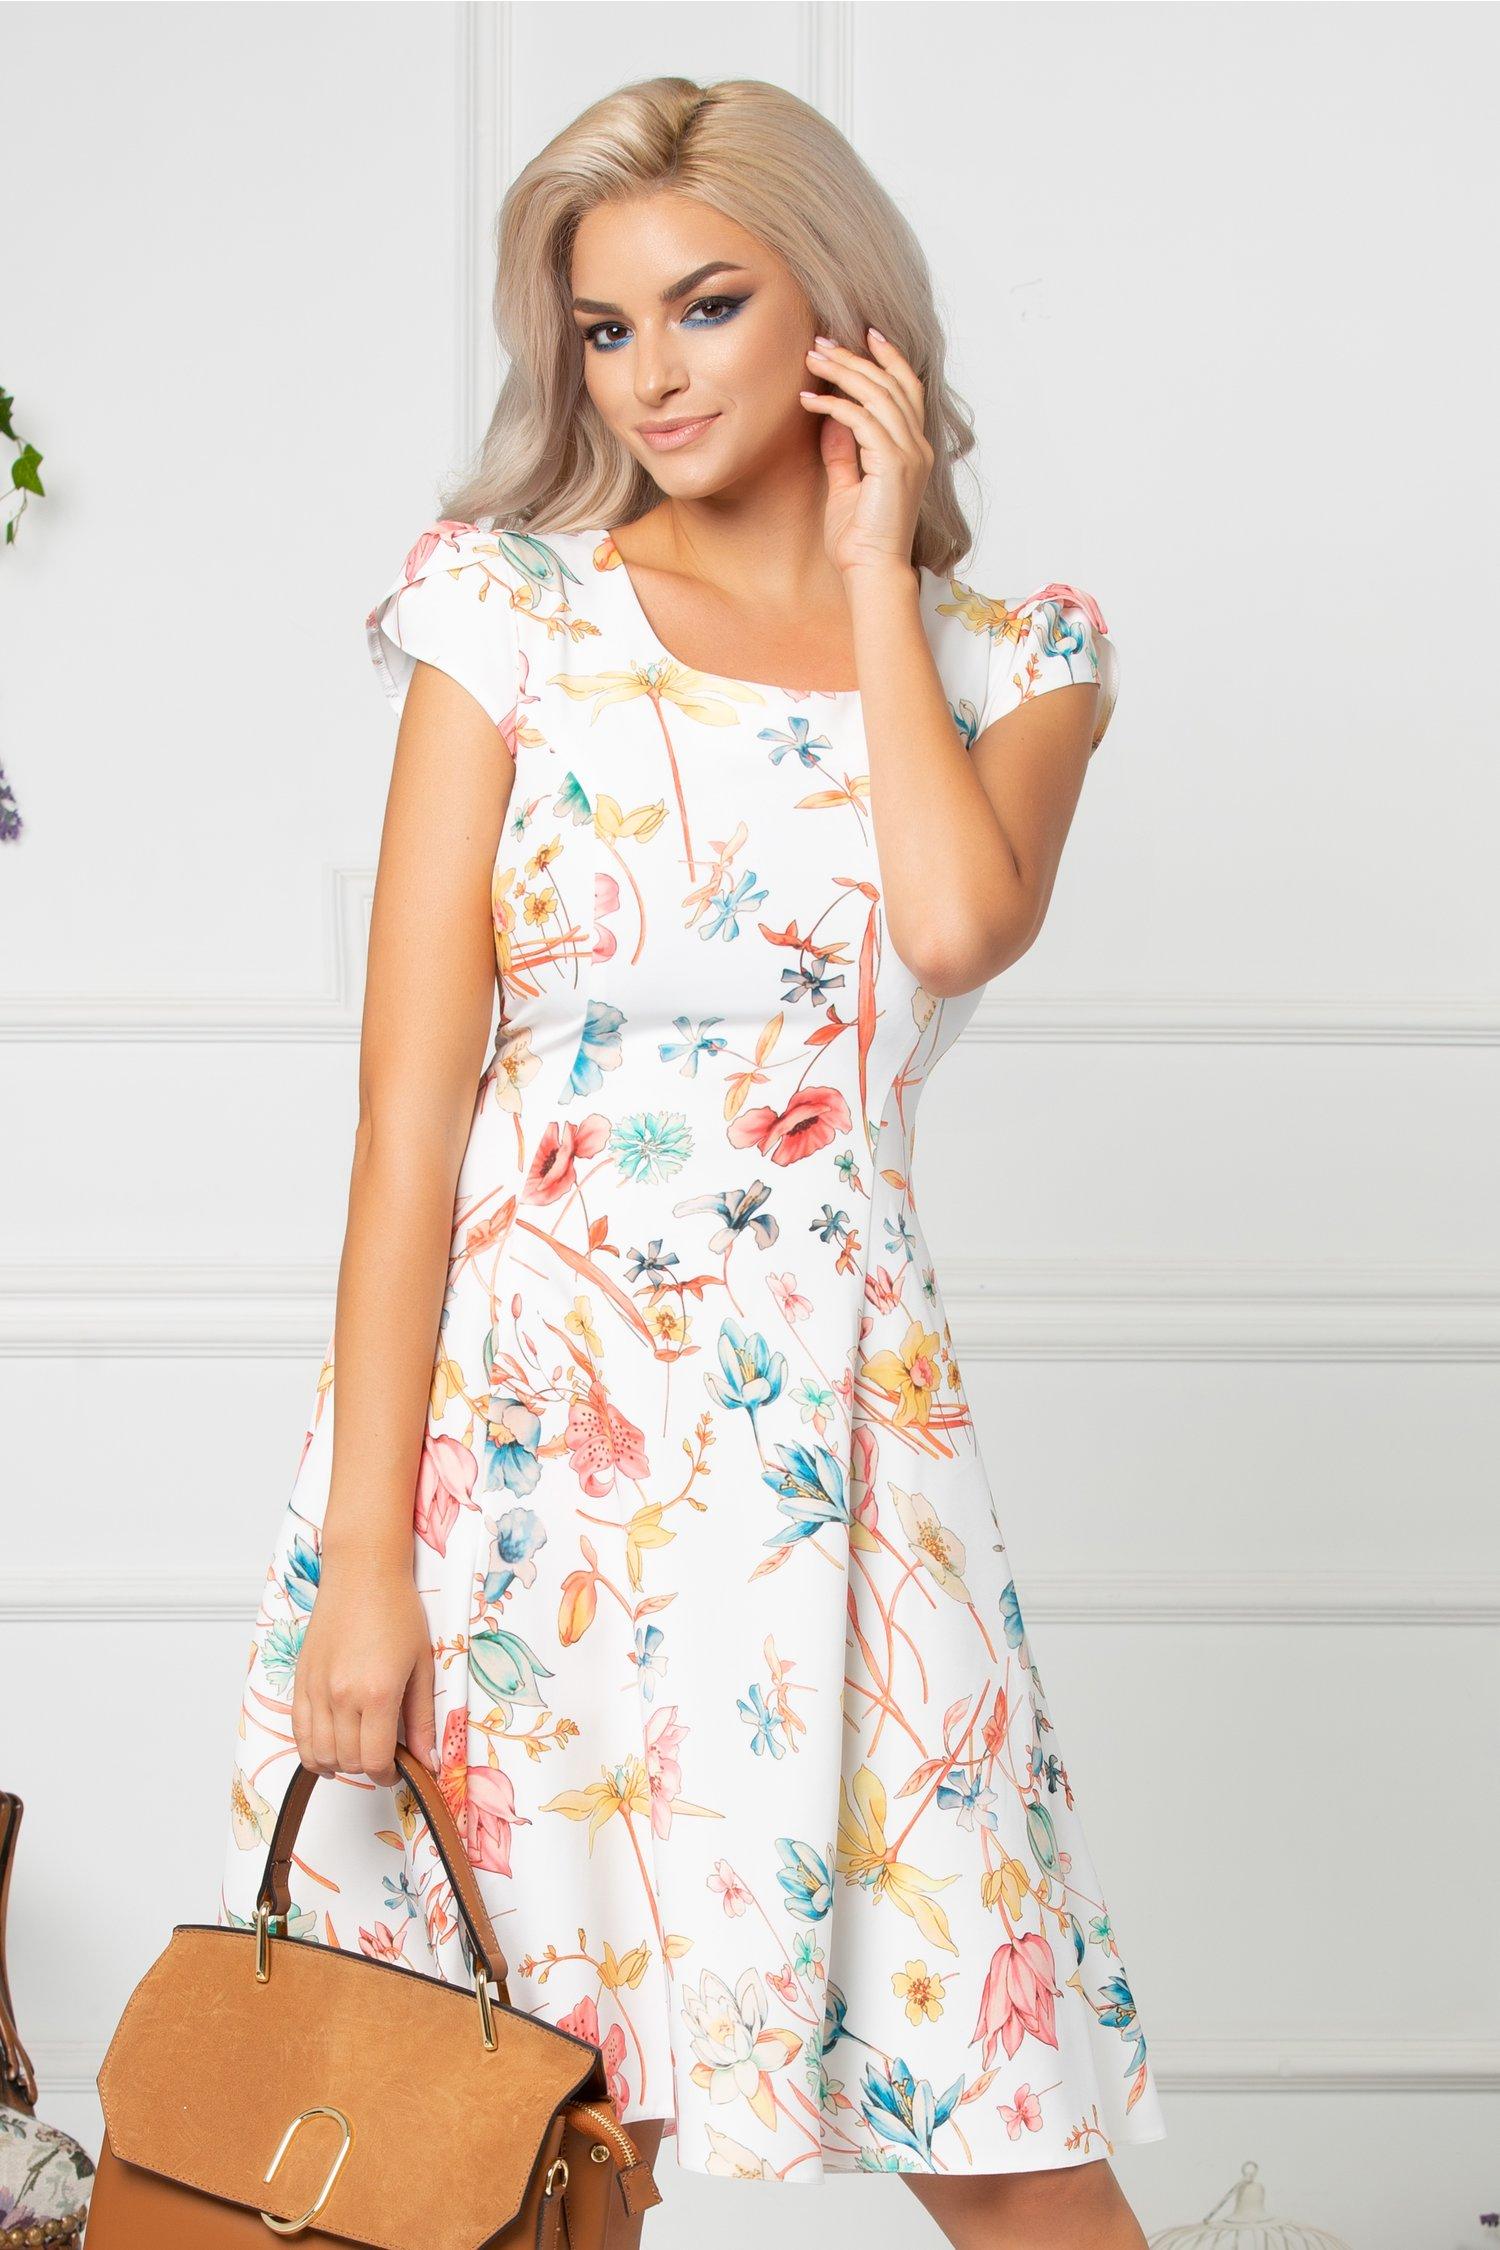 Rochie Ivonna de vara cu detalii florale colorate